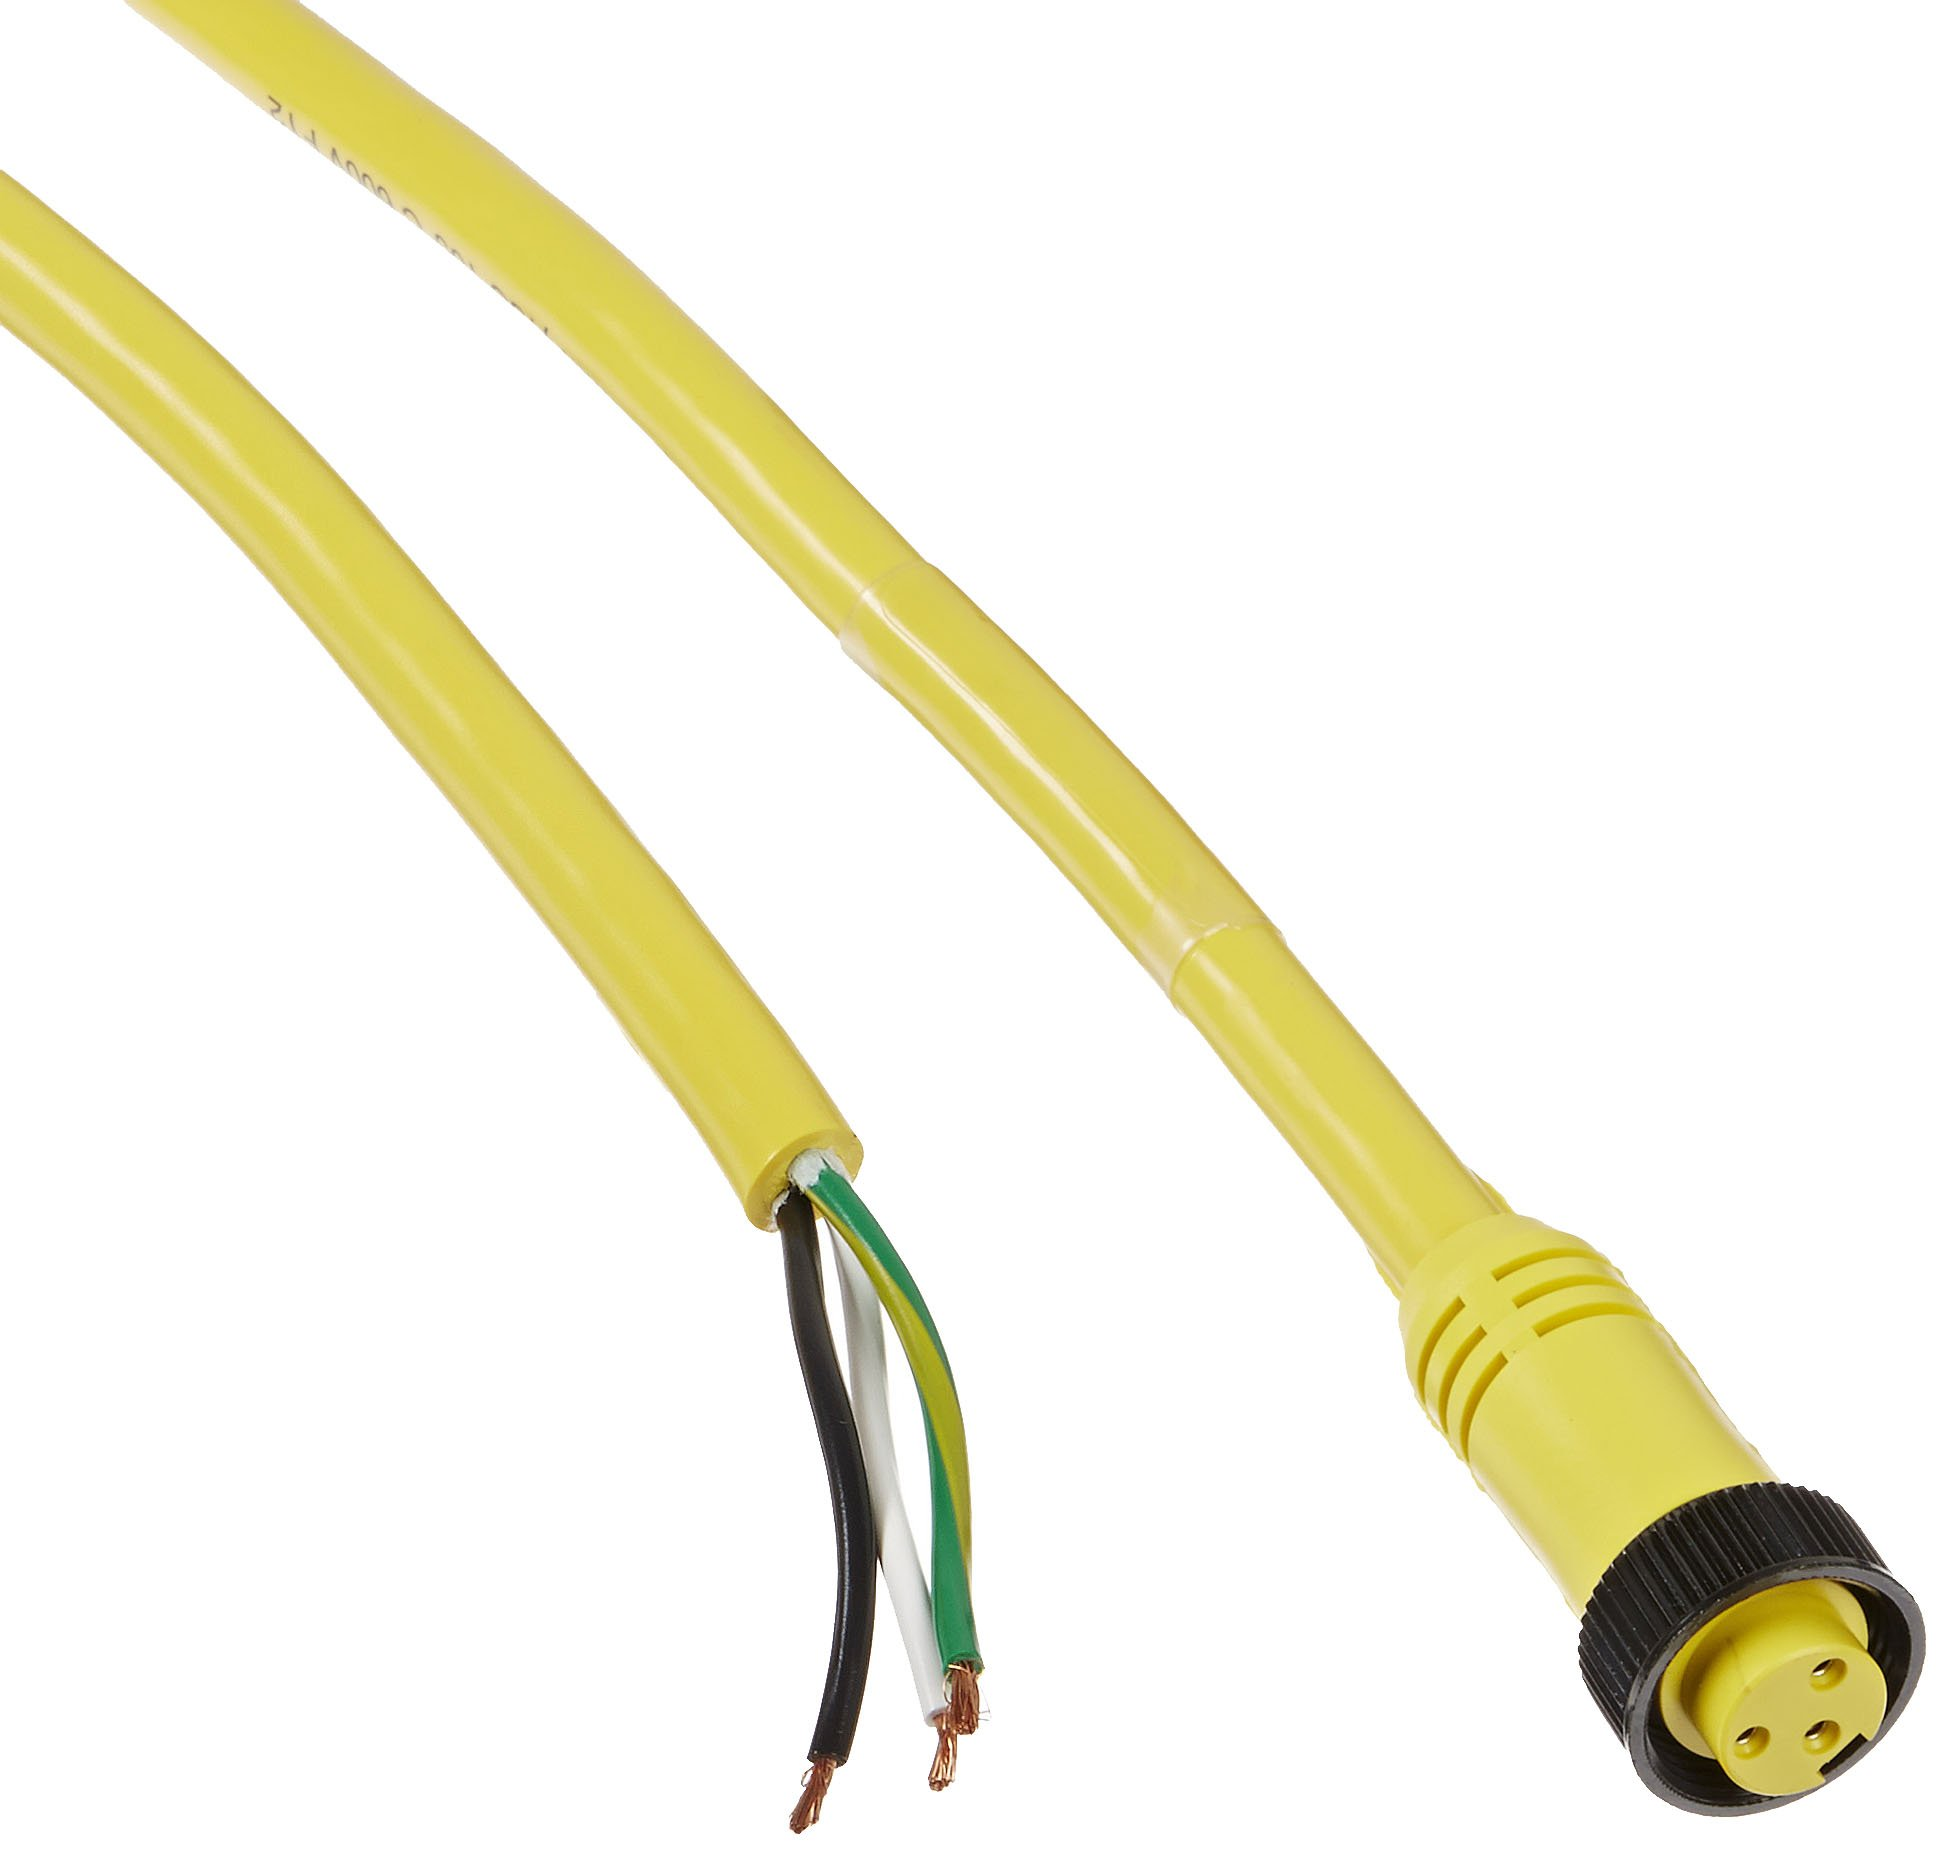 Brad Harrison 130006-0237 Mini-Change MC 3P FP 15' 16/3 PVC